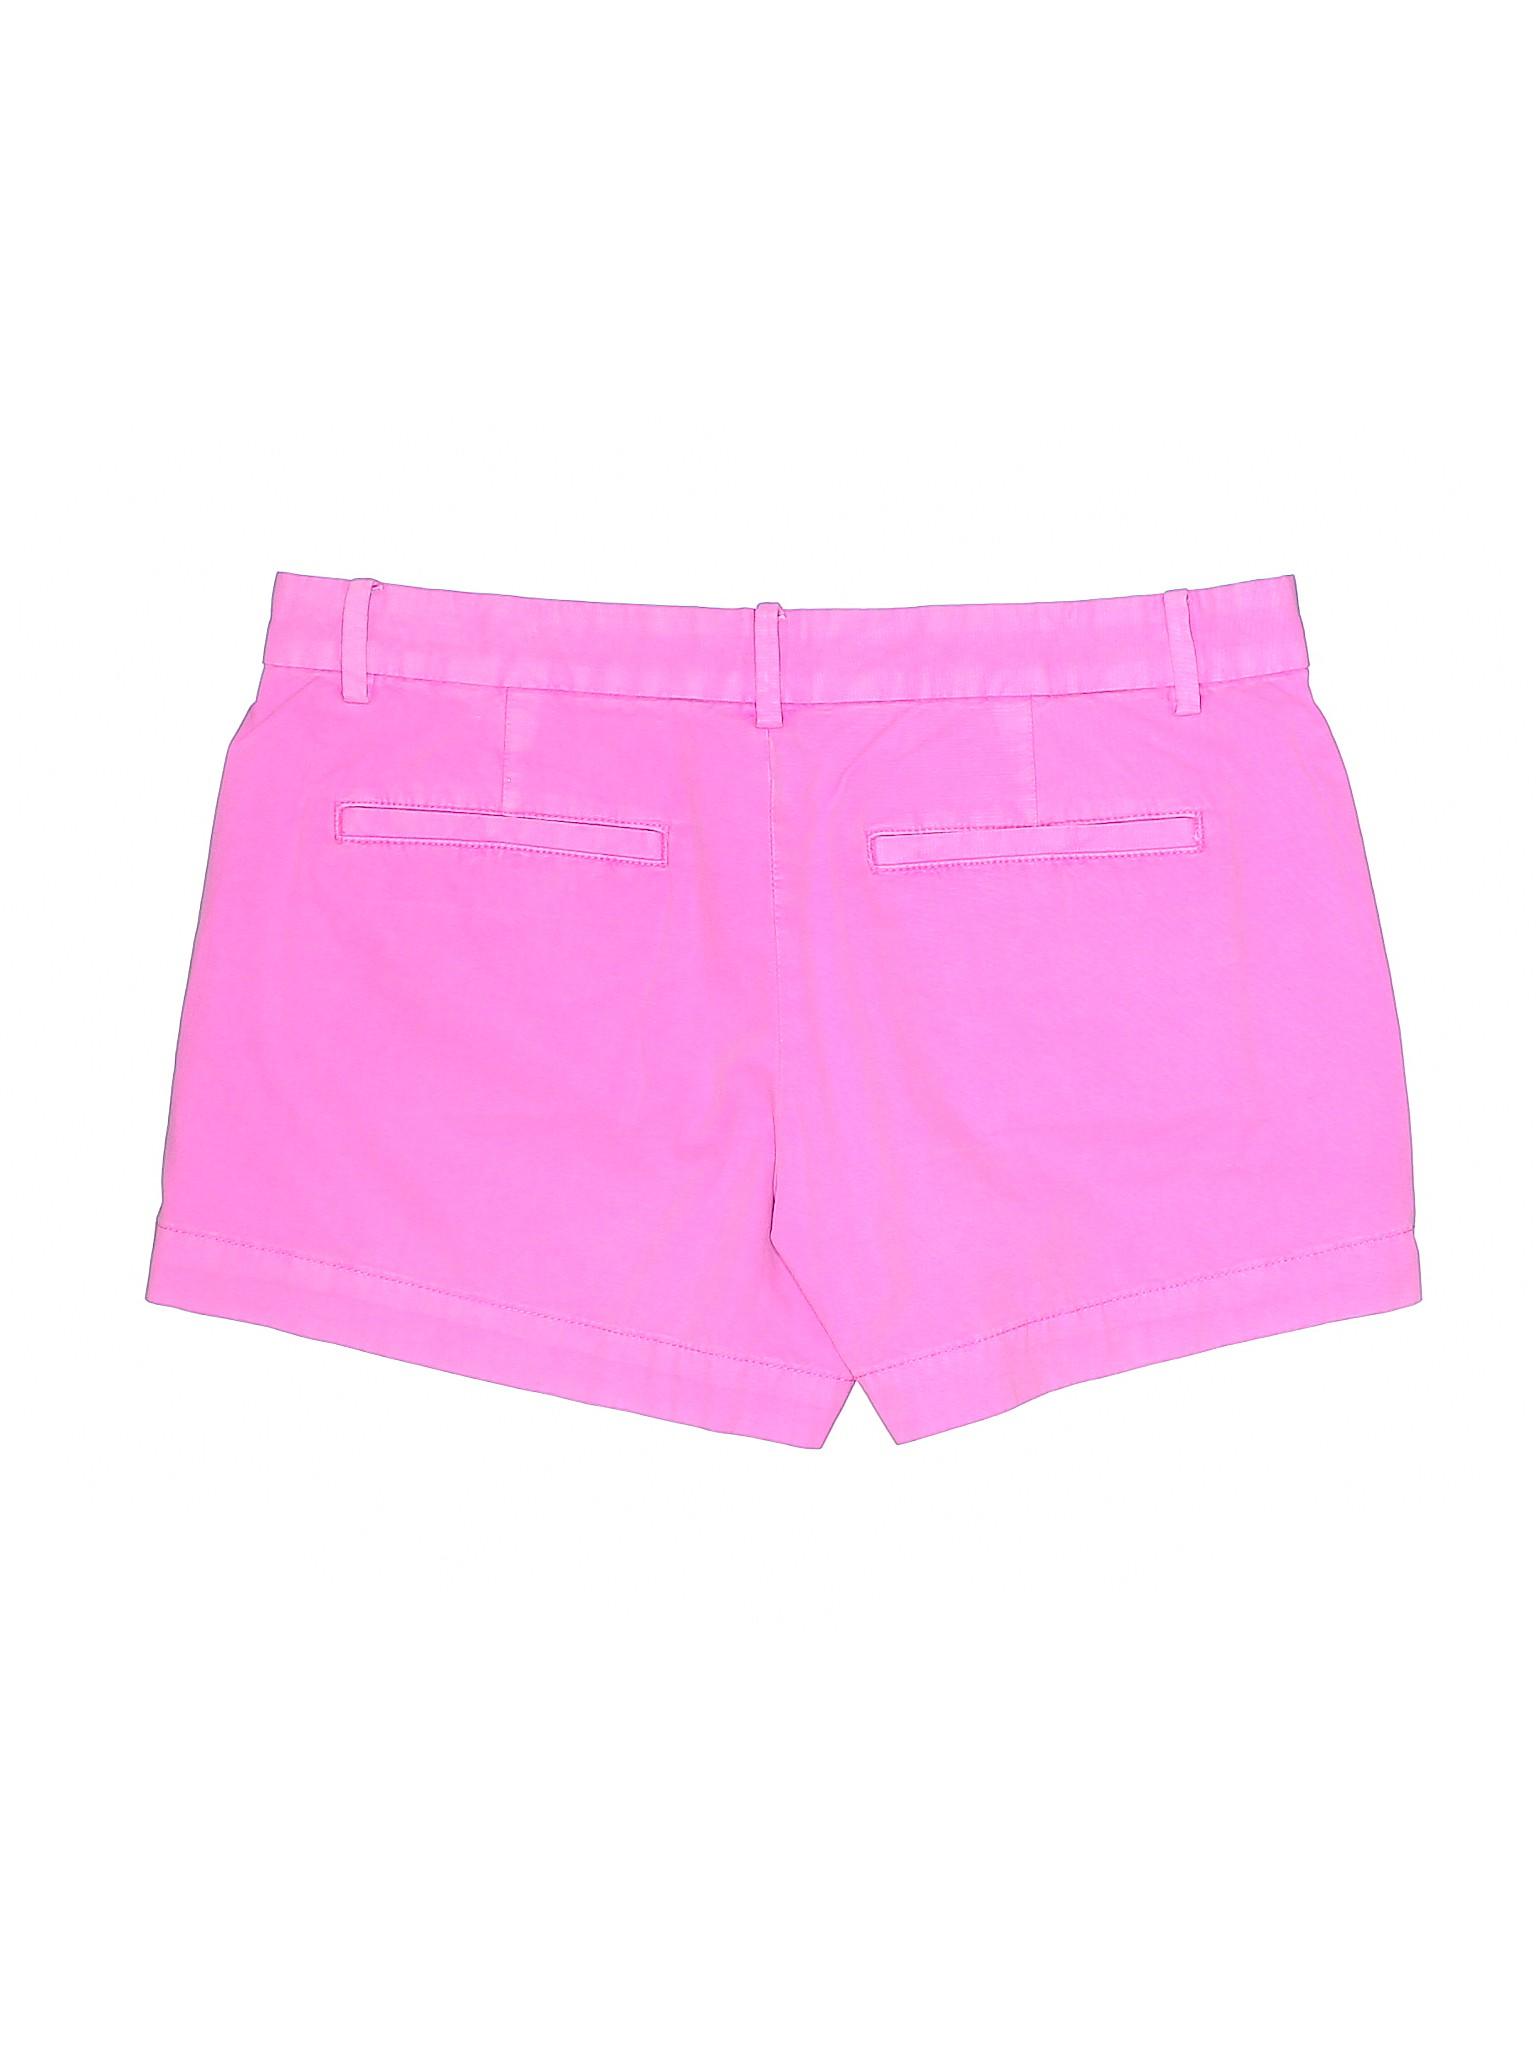 Boutique Gap Khaki Shorts Shorts Shorts Khaki Gap Boutique Gap Boutique Shorts Boutique Gap Khaki Khaki Boutique 11ArqUI